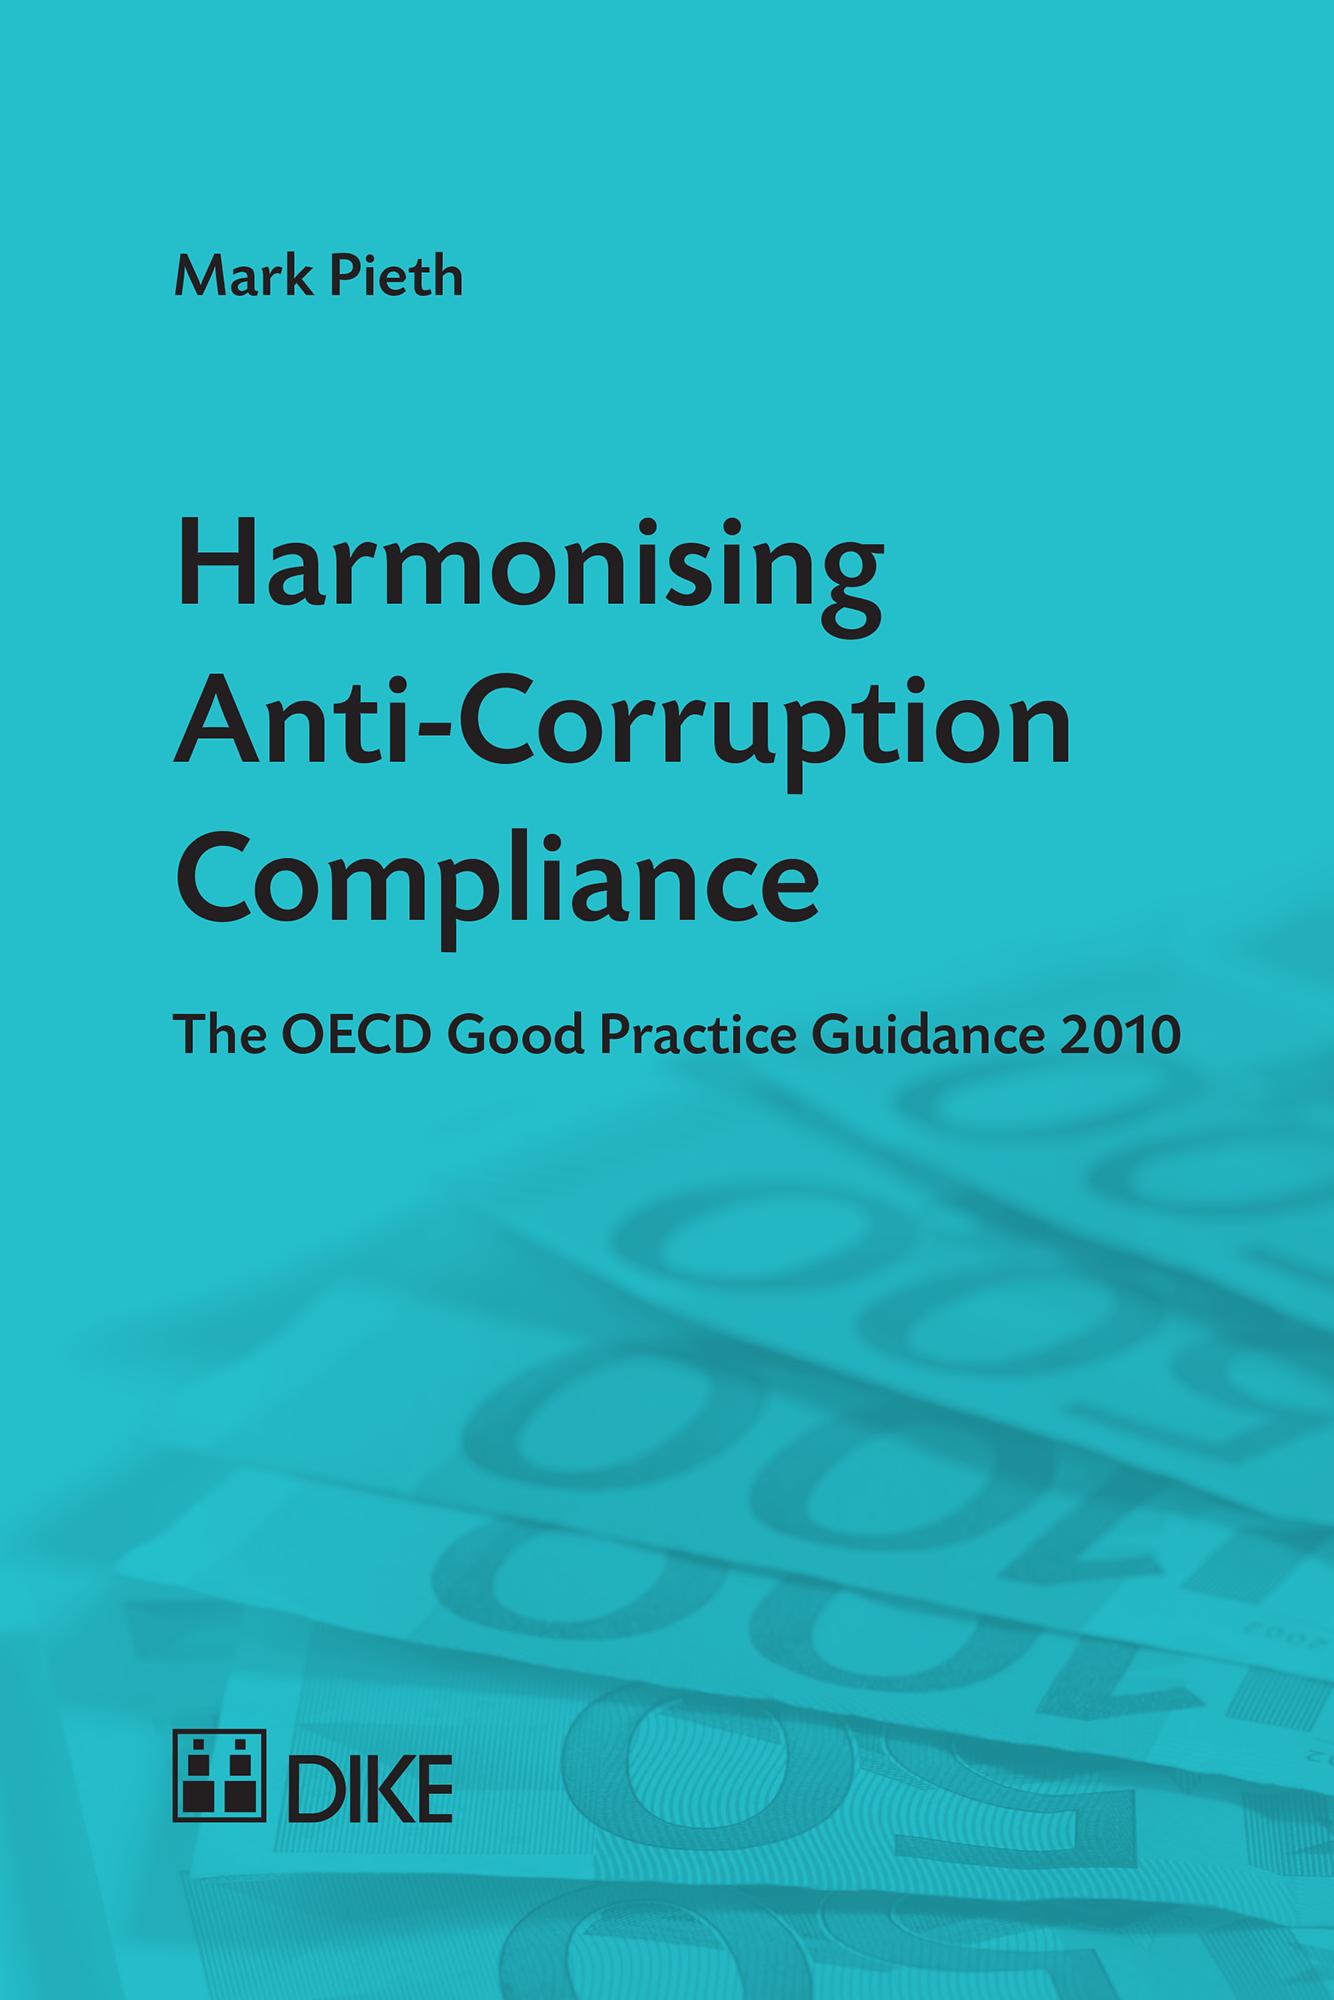 Harmonising Anti-Corruption Compliance